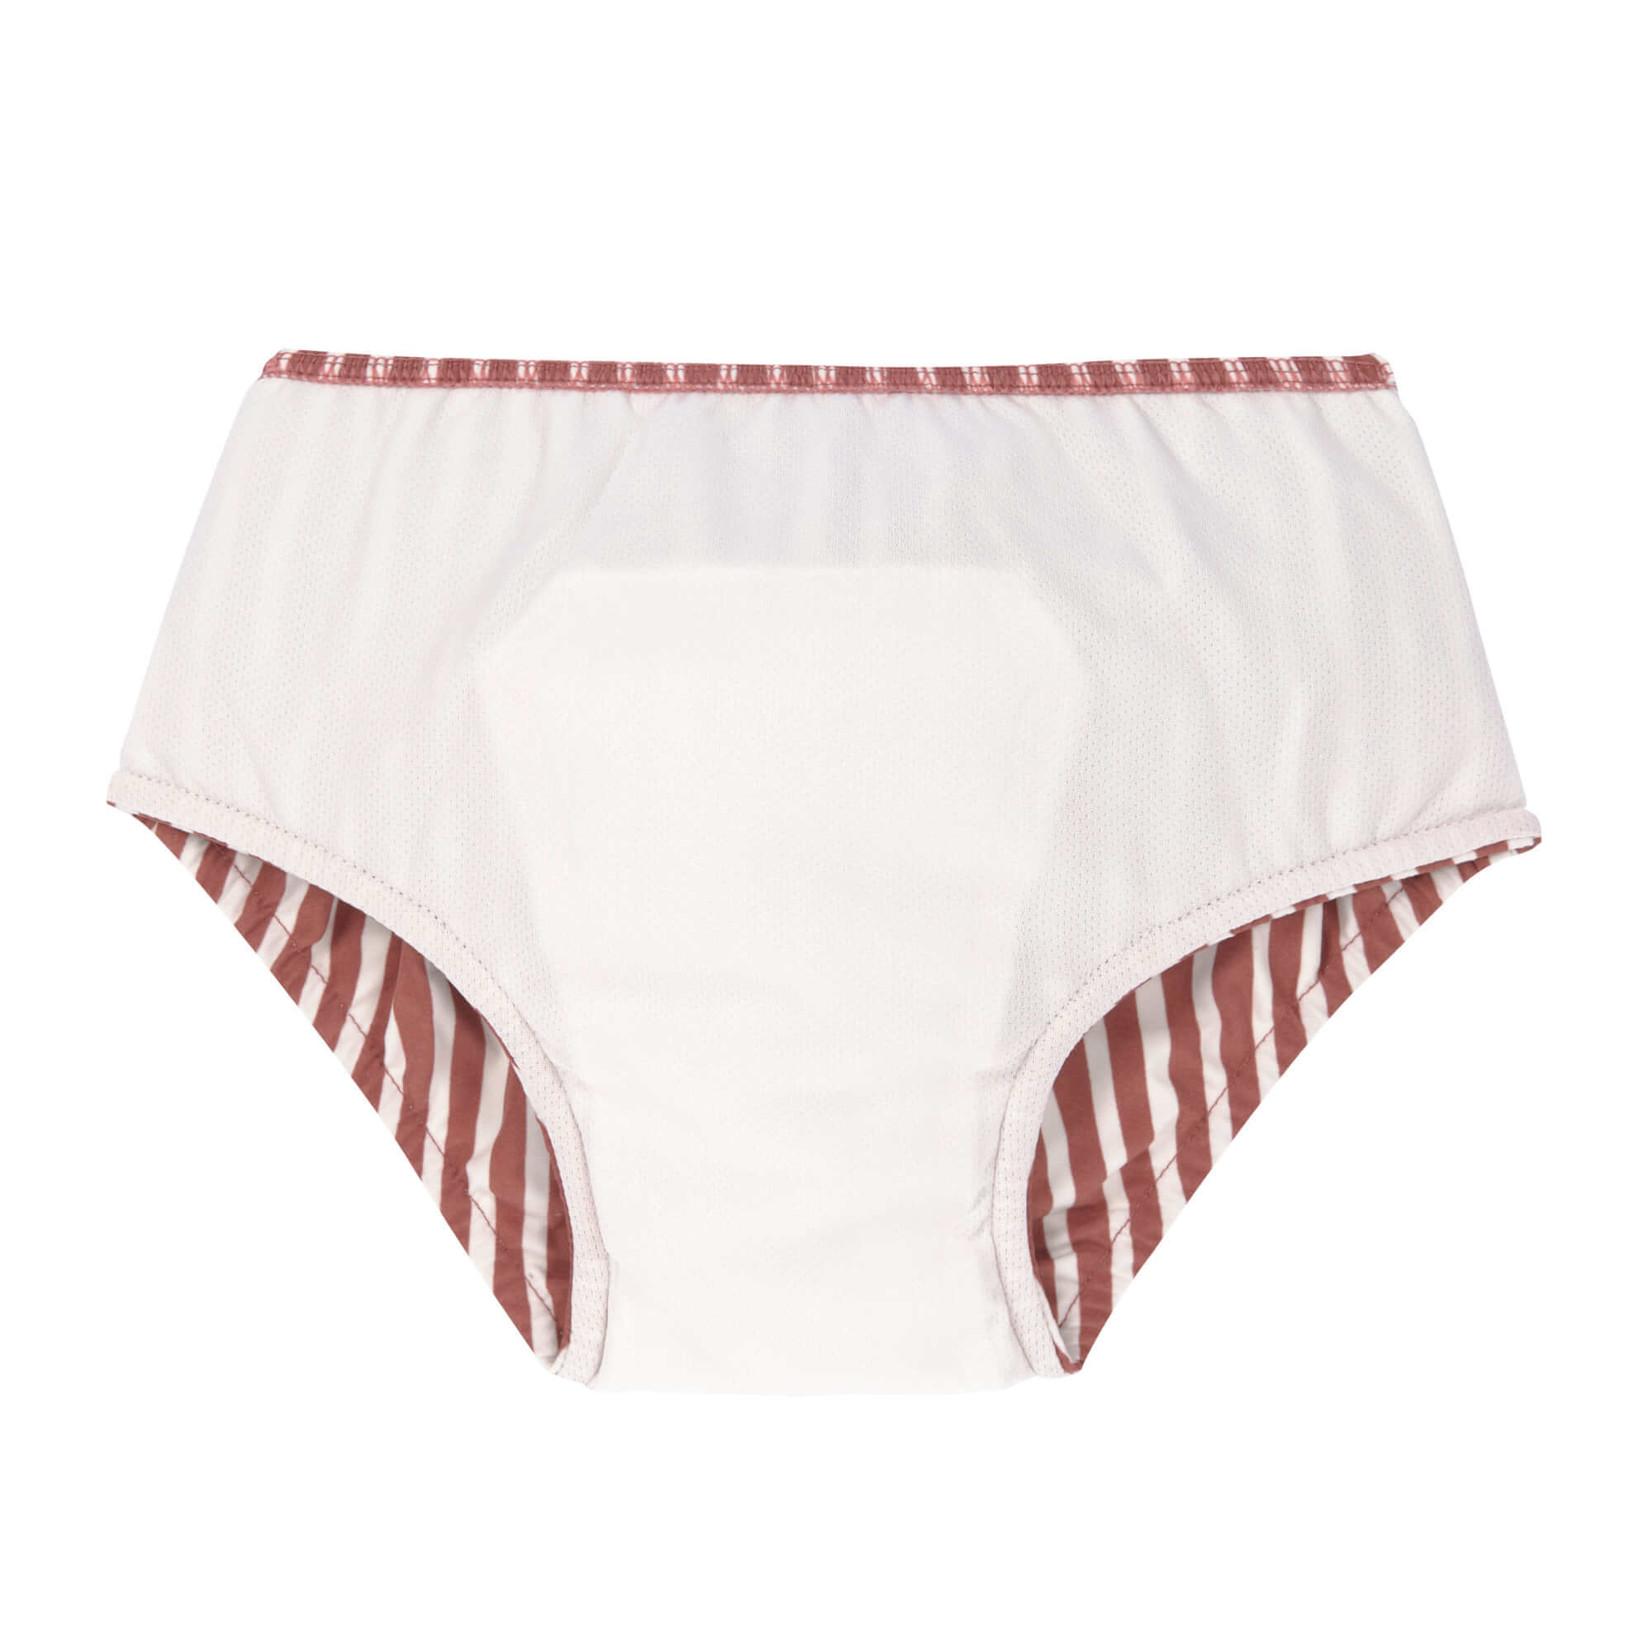 Lässig LSF Swim Diaper Girls  Stripes Red